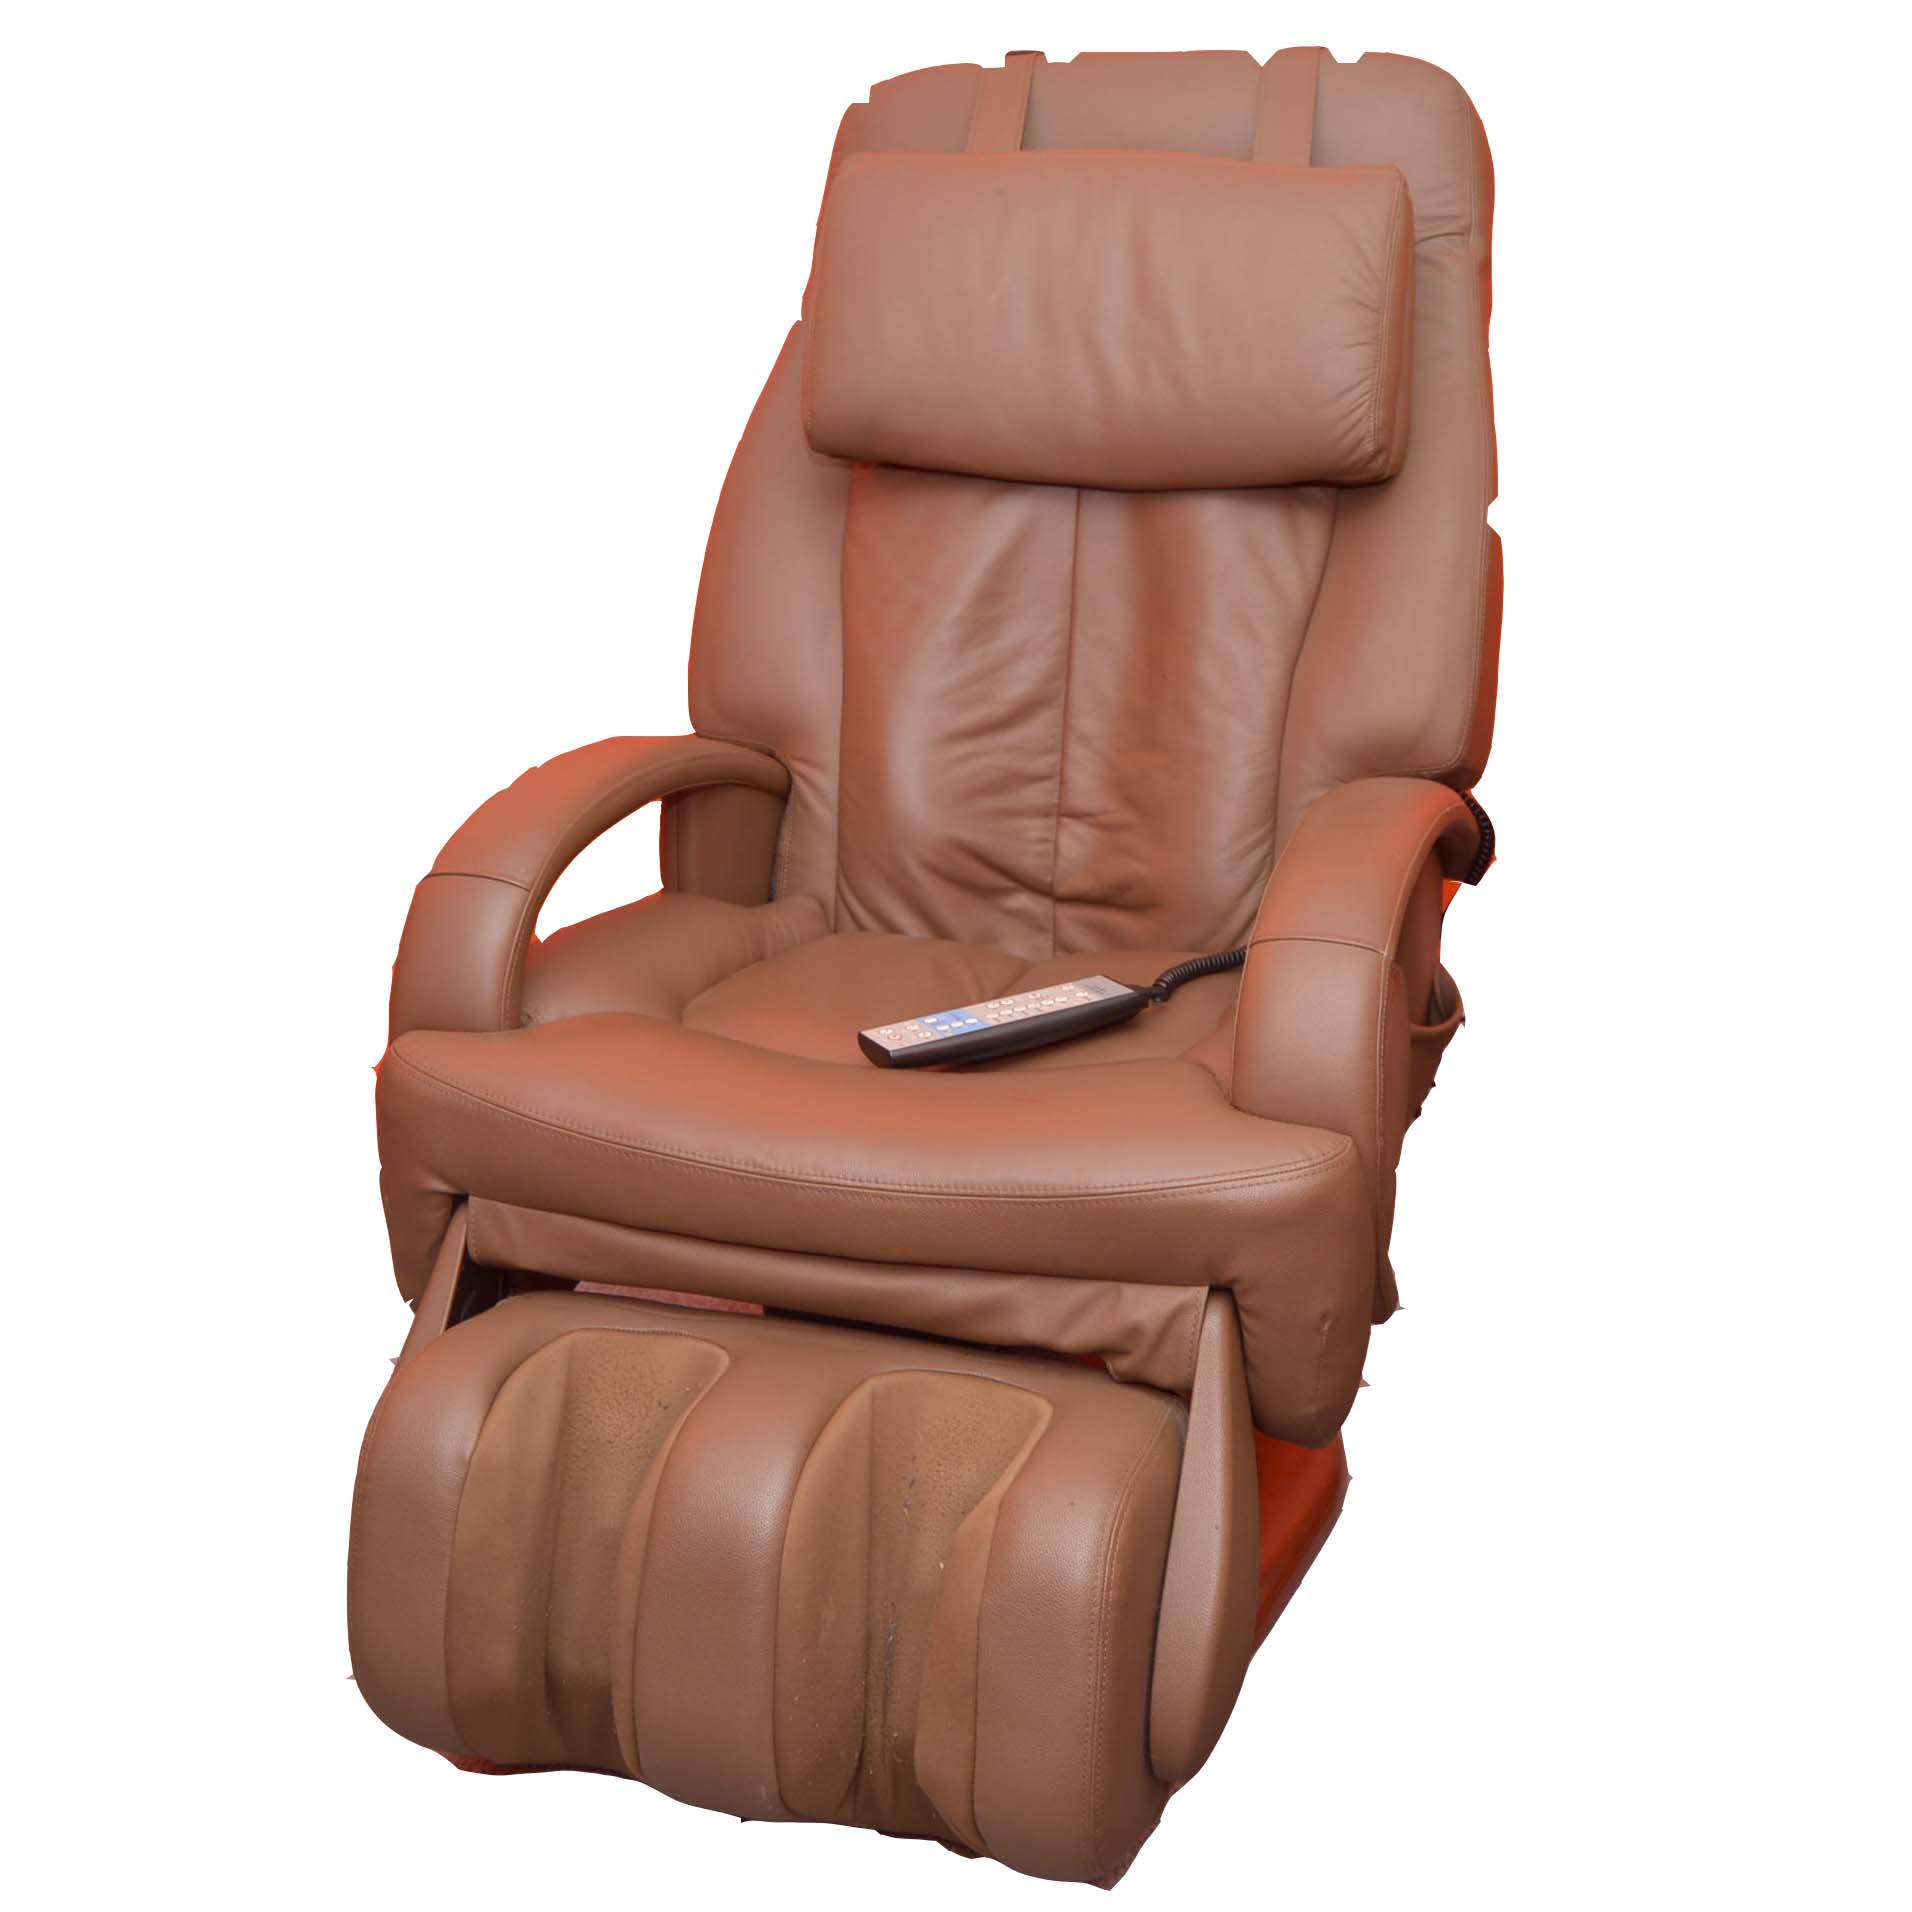 sharper image massage chairs buy bean bag chair ht 270 human touch robotic ebth